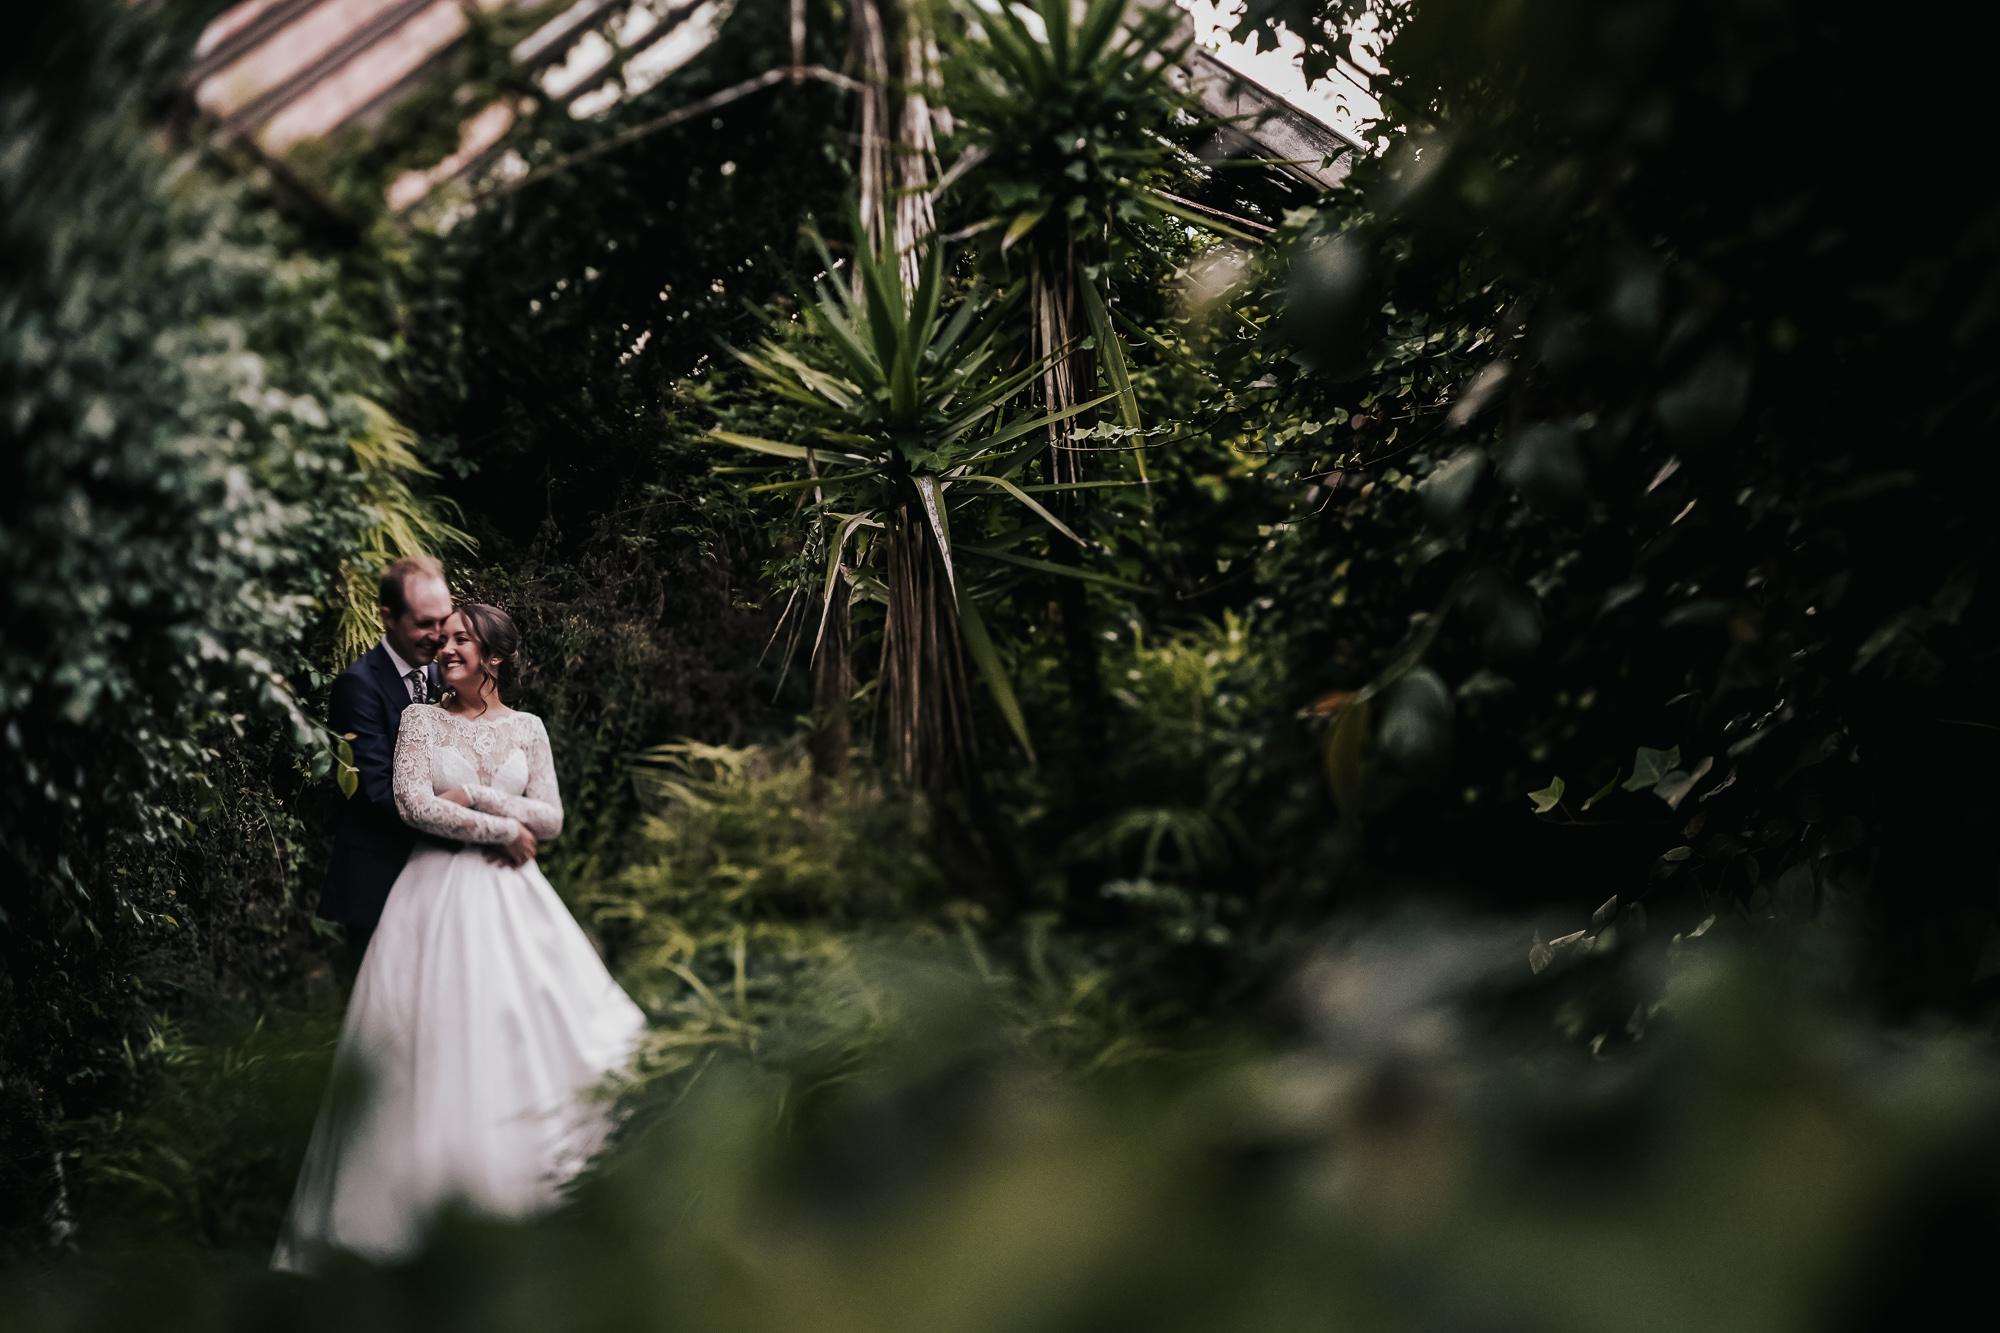 Thornton Manor Cheshire wedding photographer Wedding Photography Cheshire wedding photographer (57 of 64).jpg